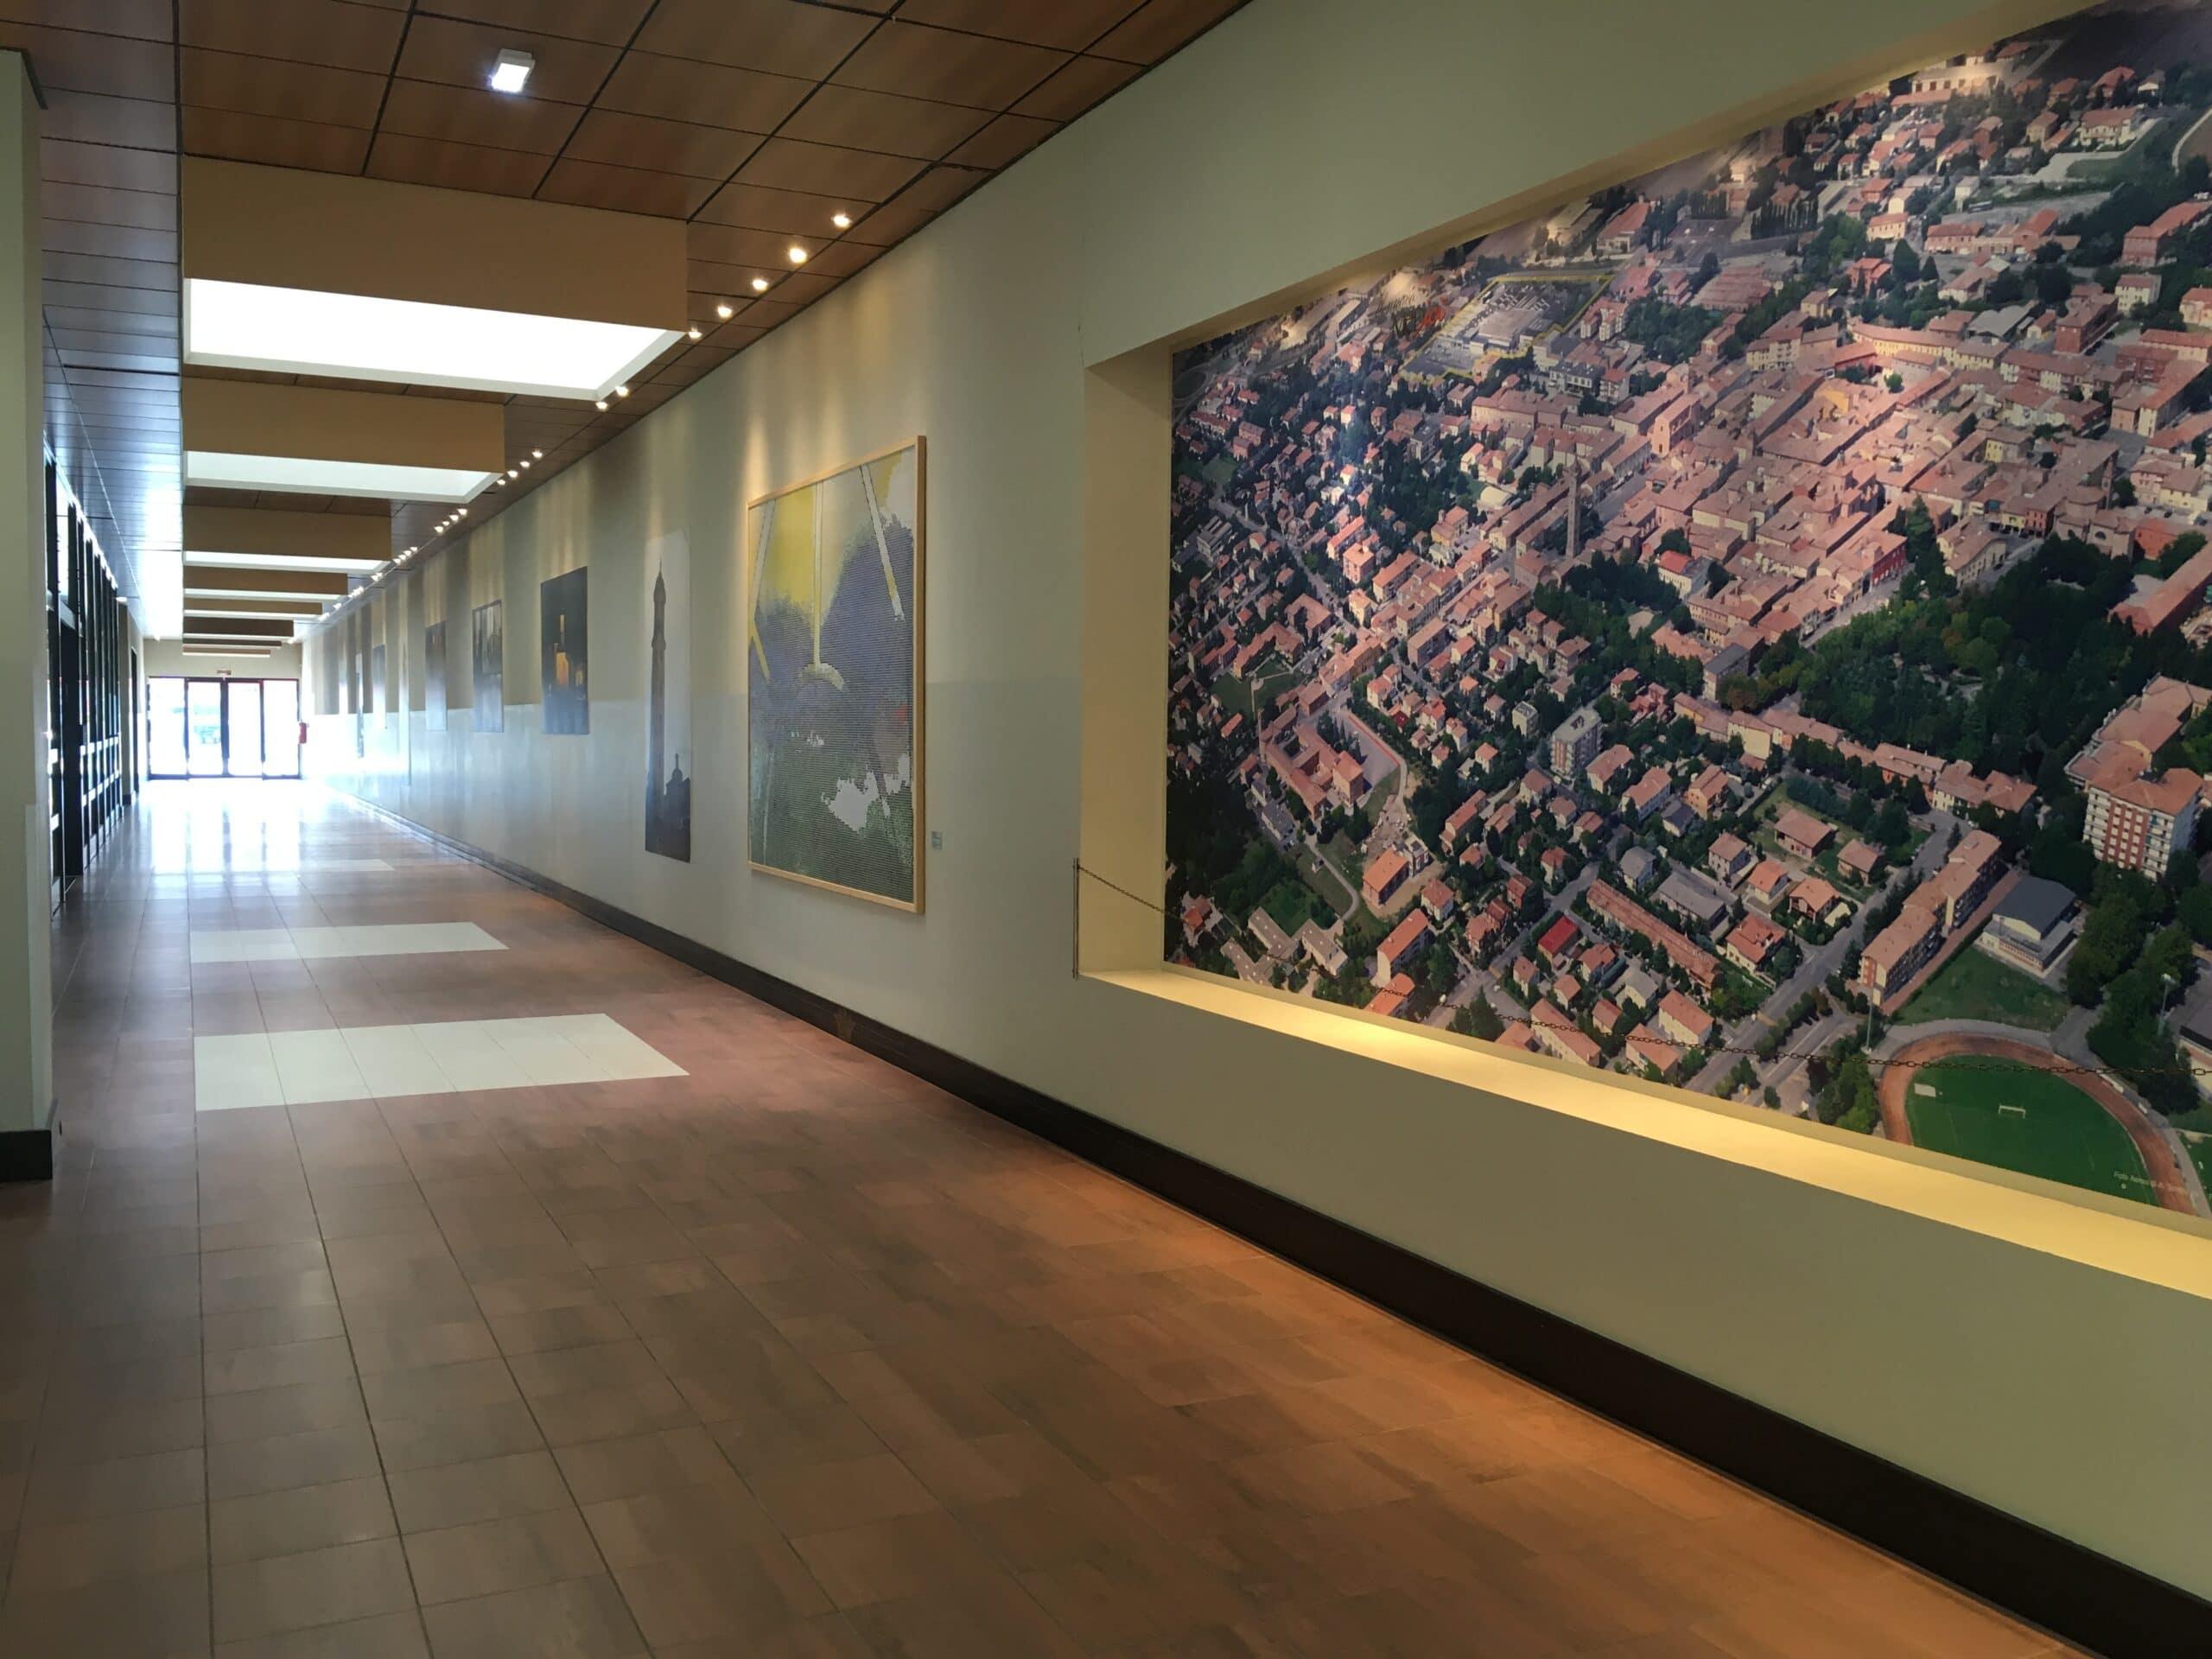 Centro Commerciale Medicì - Corridoio